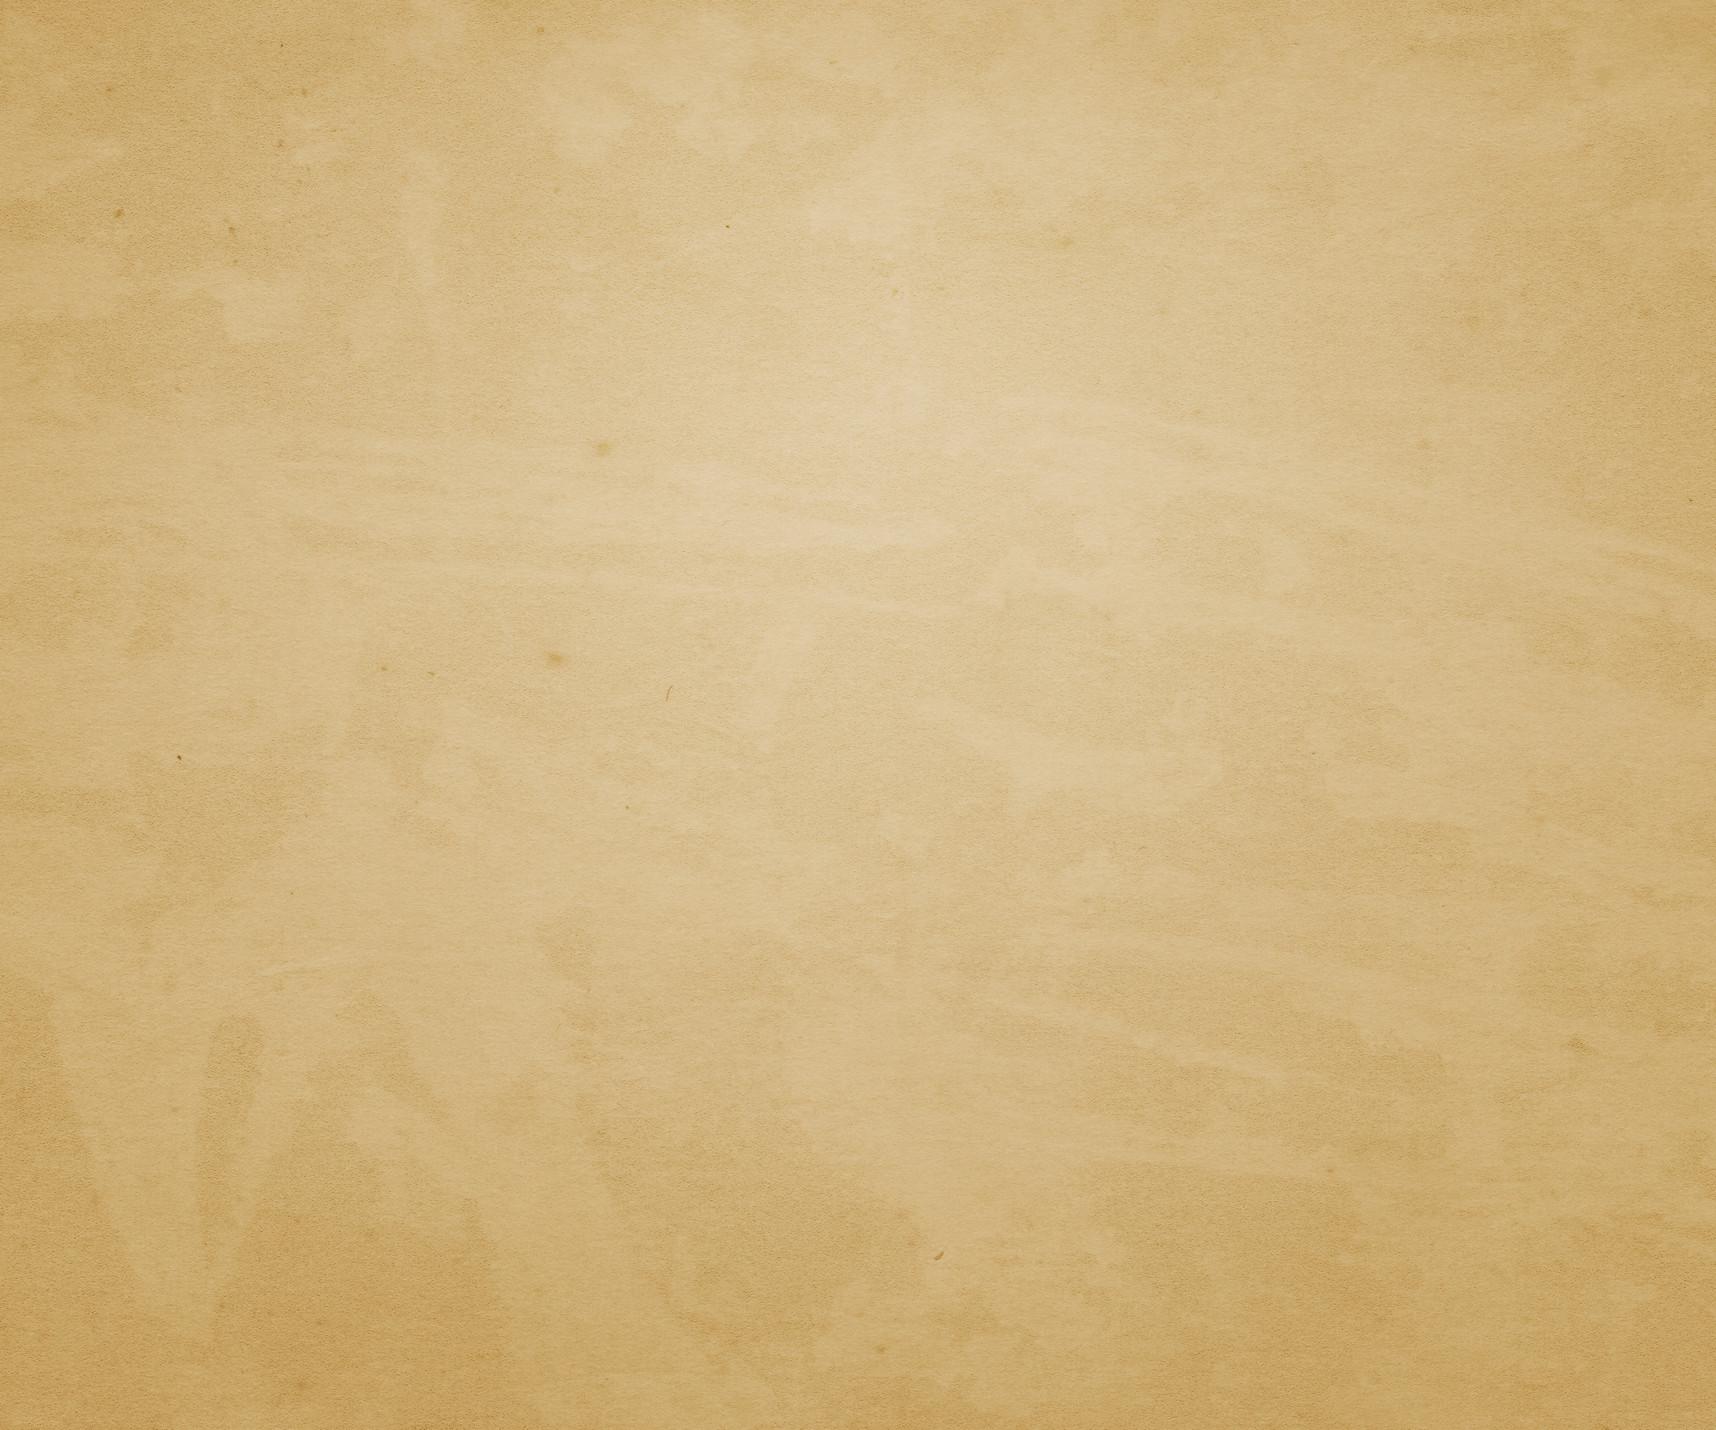 paper-texture_zJ-jwPc_.jpg